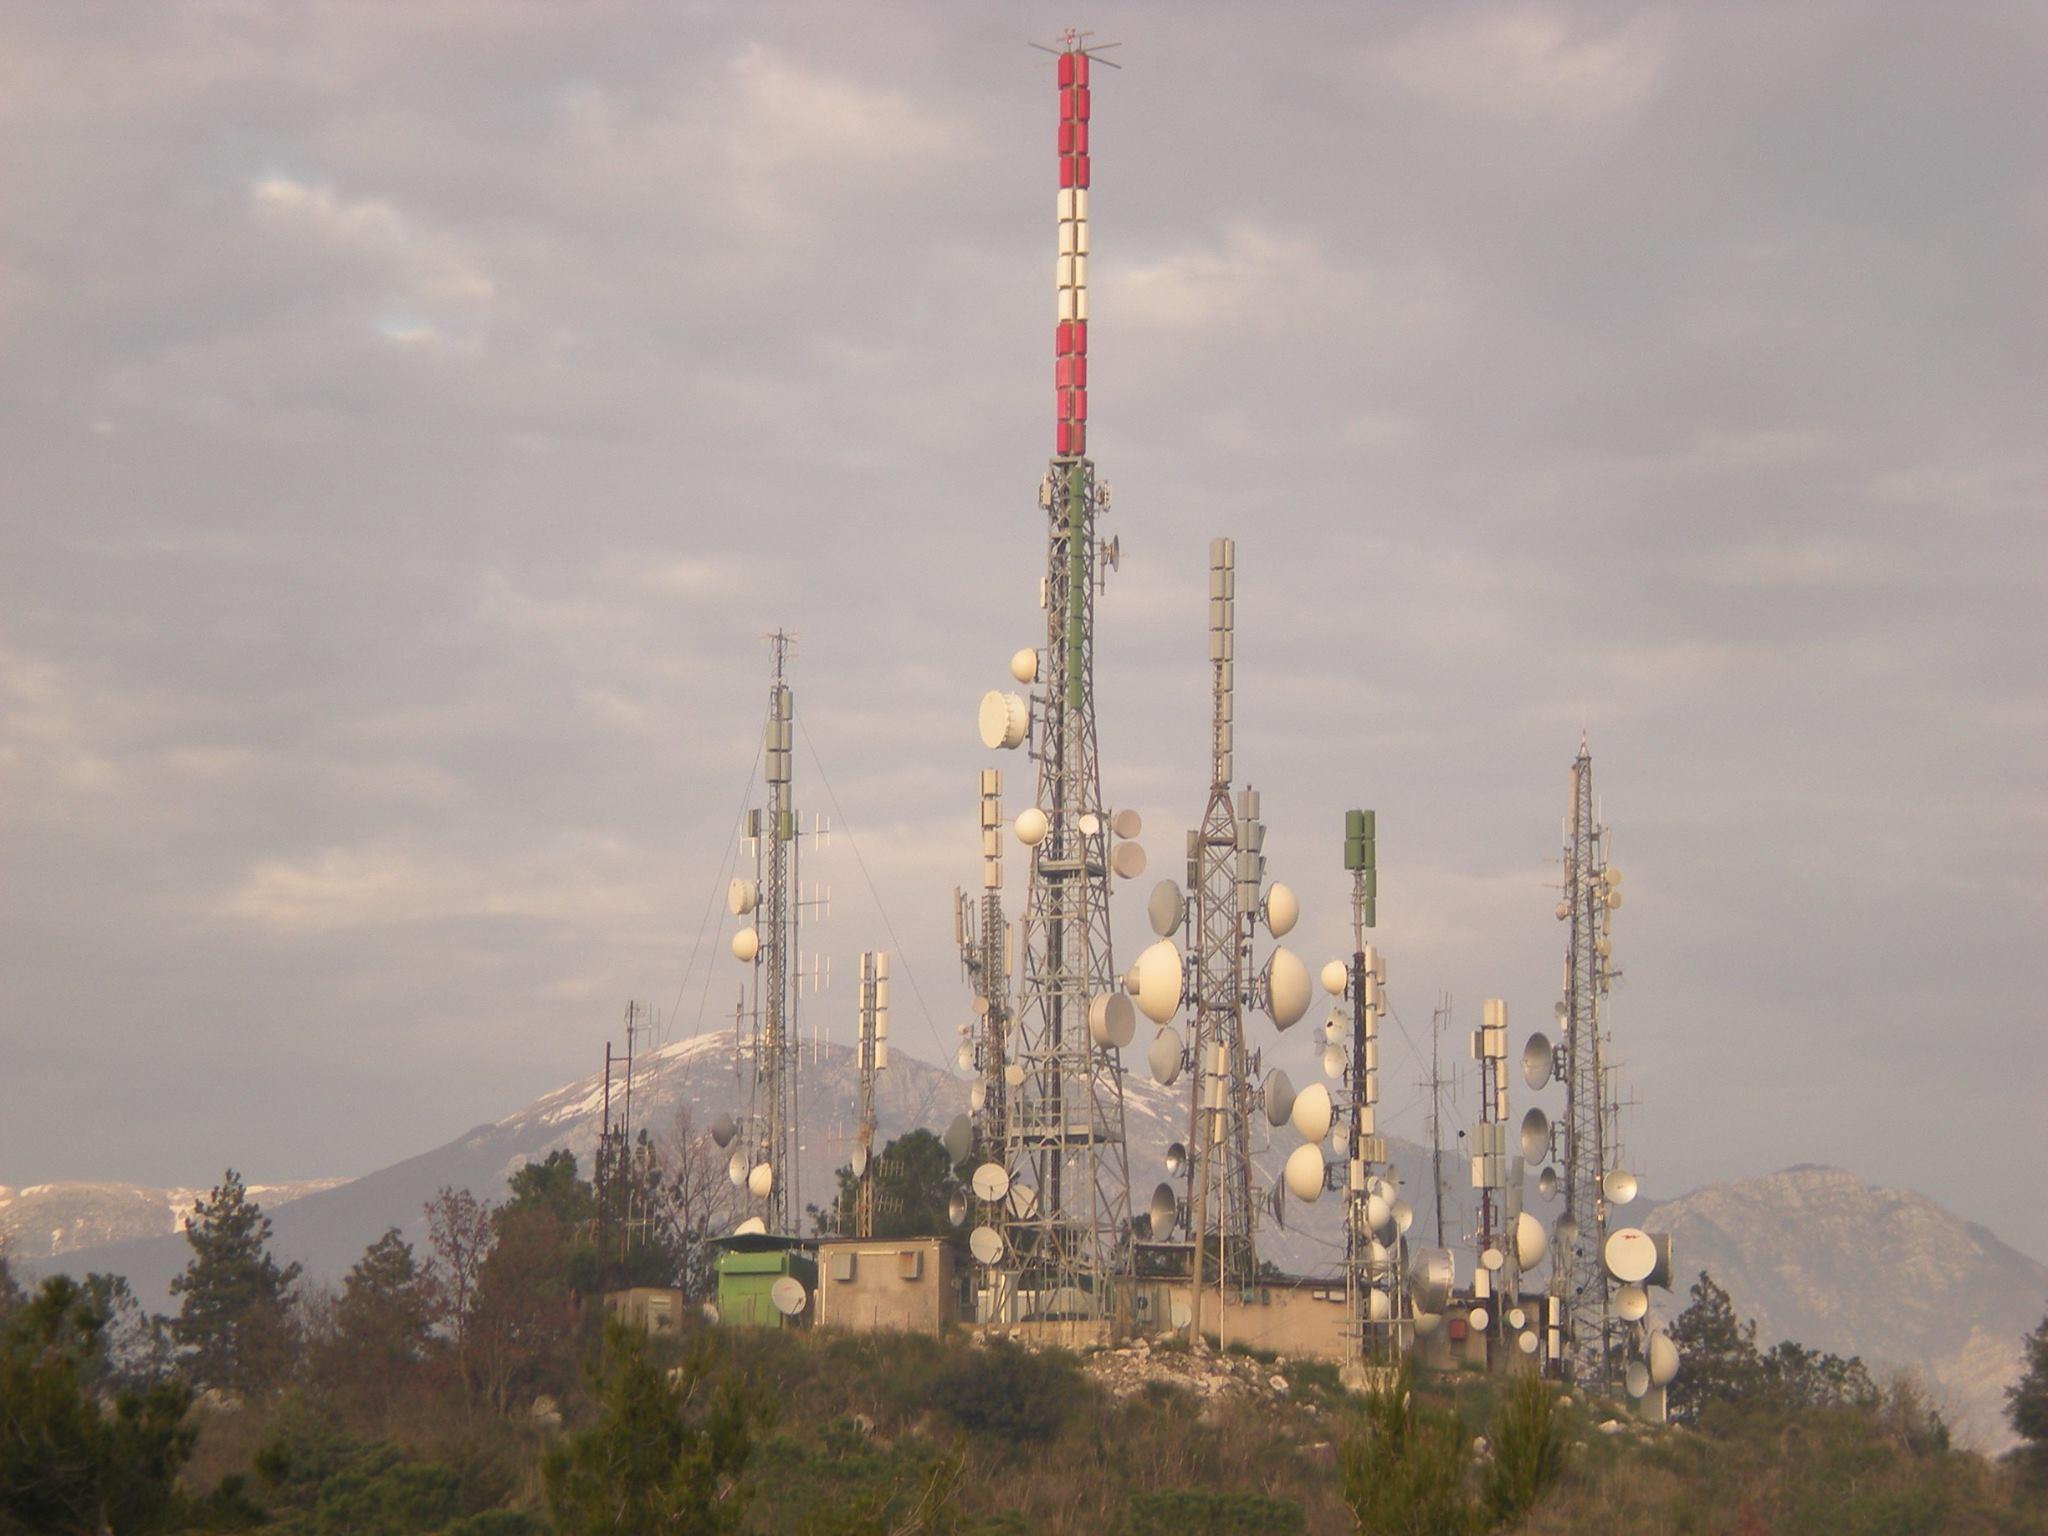 Antenne FM e UHF Monte Alatri FR - Tlc e media. Rapporto Agcom: anche nel 2017 Sky primo operatore. Seguono Mediaset e poi RAI